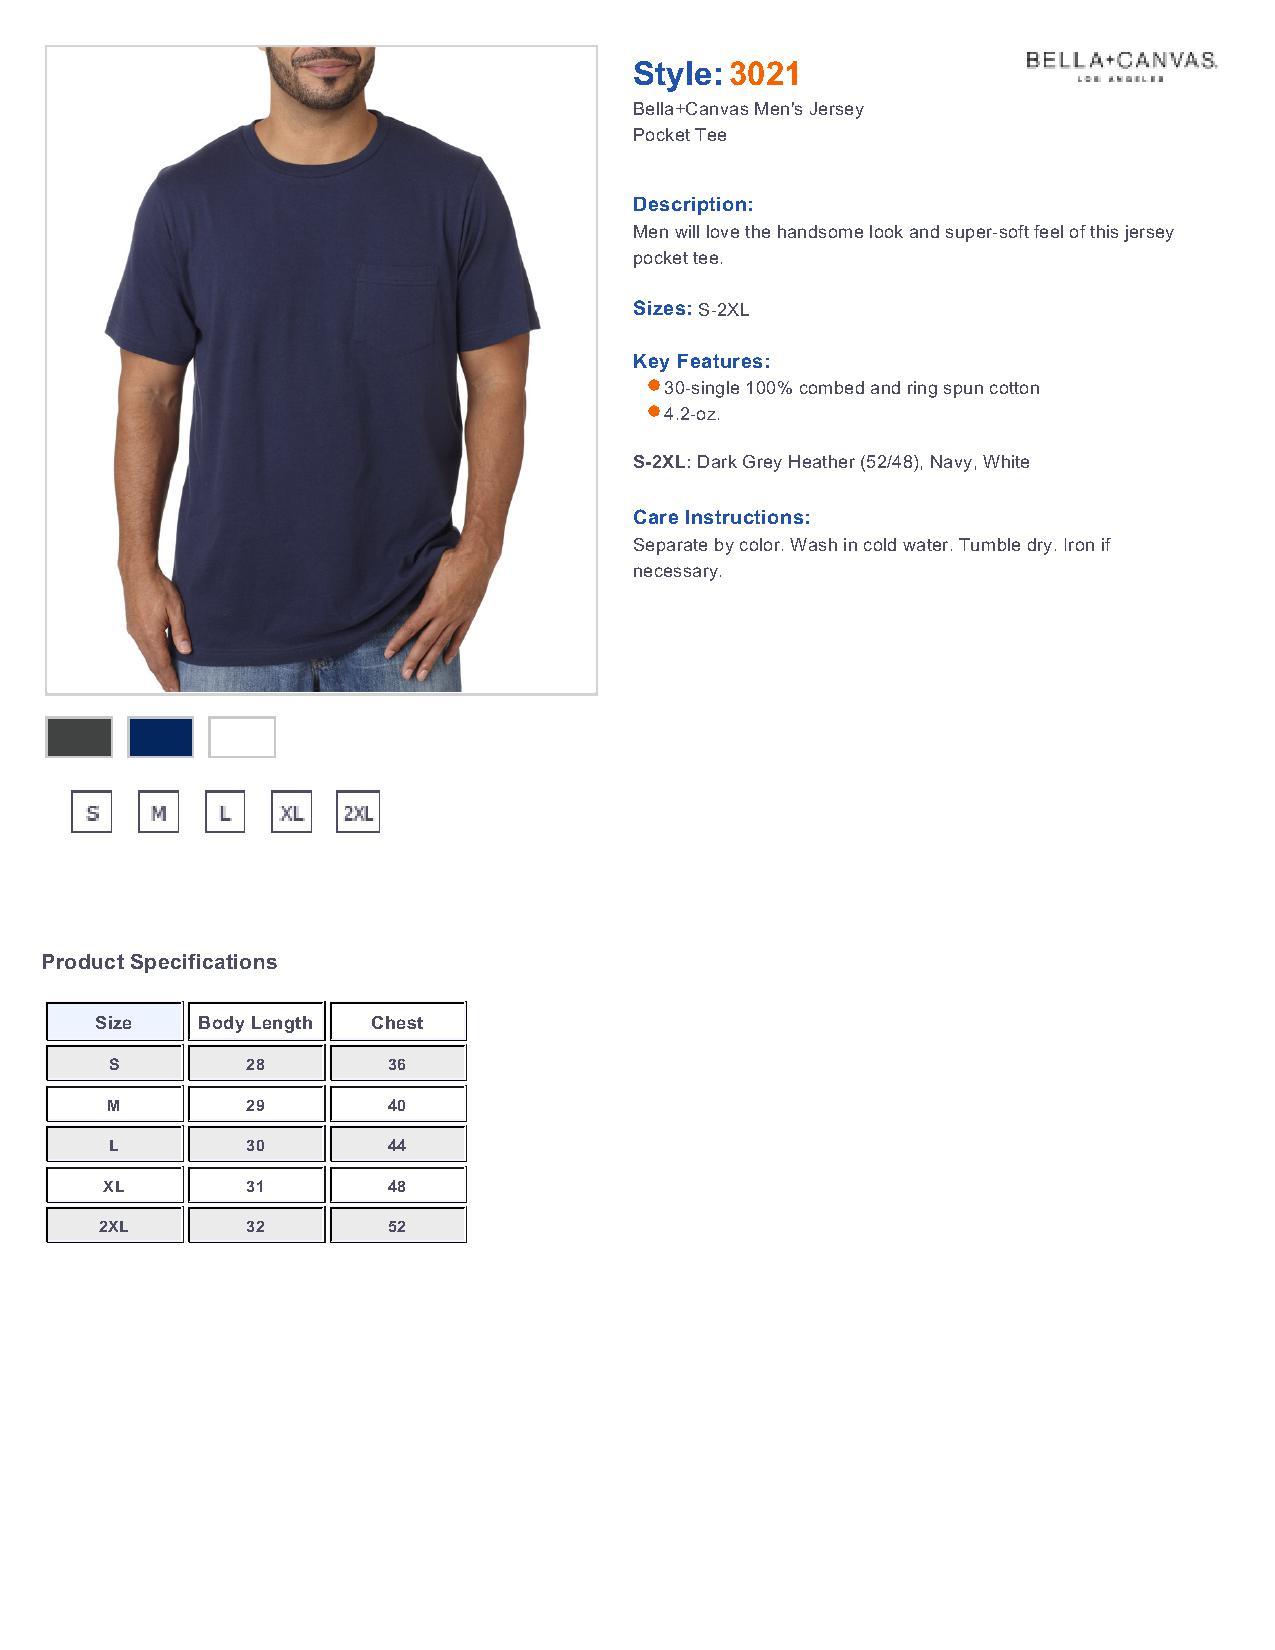 e969ef955425 Bella + Canvas 3021 Men's Jersey Short-Sleeve Pocket T-Shirt $6.69 ...